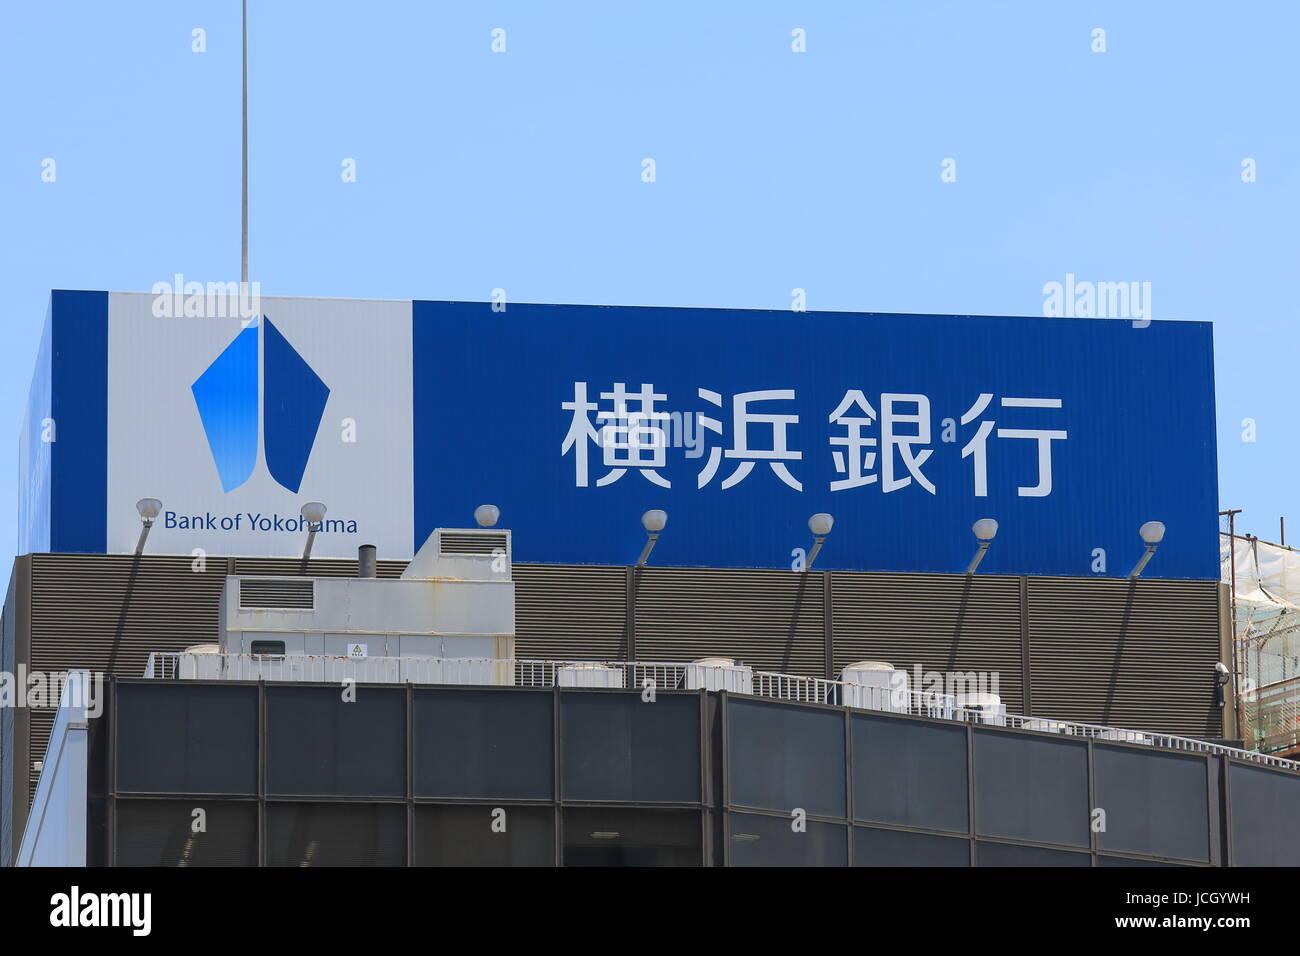 Bank of Yokohama. Bank of Yokohama is the largest regional bank in Japan, operating mainly in Kanagawa Prefecture. - Stock Image